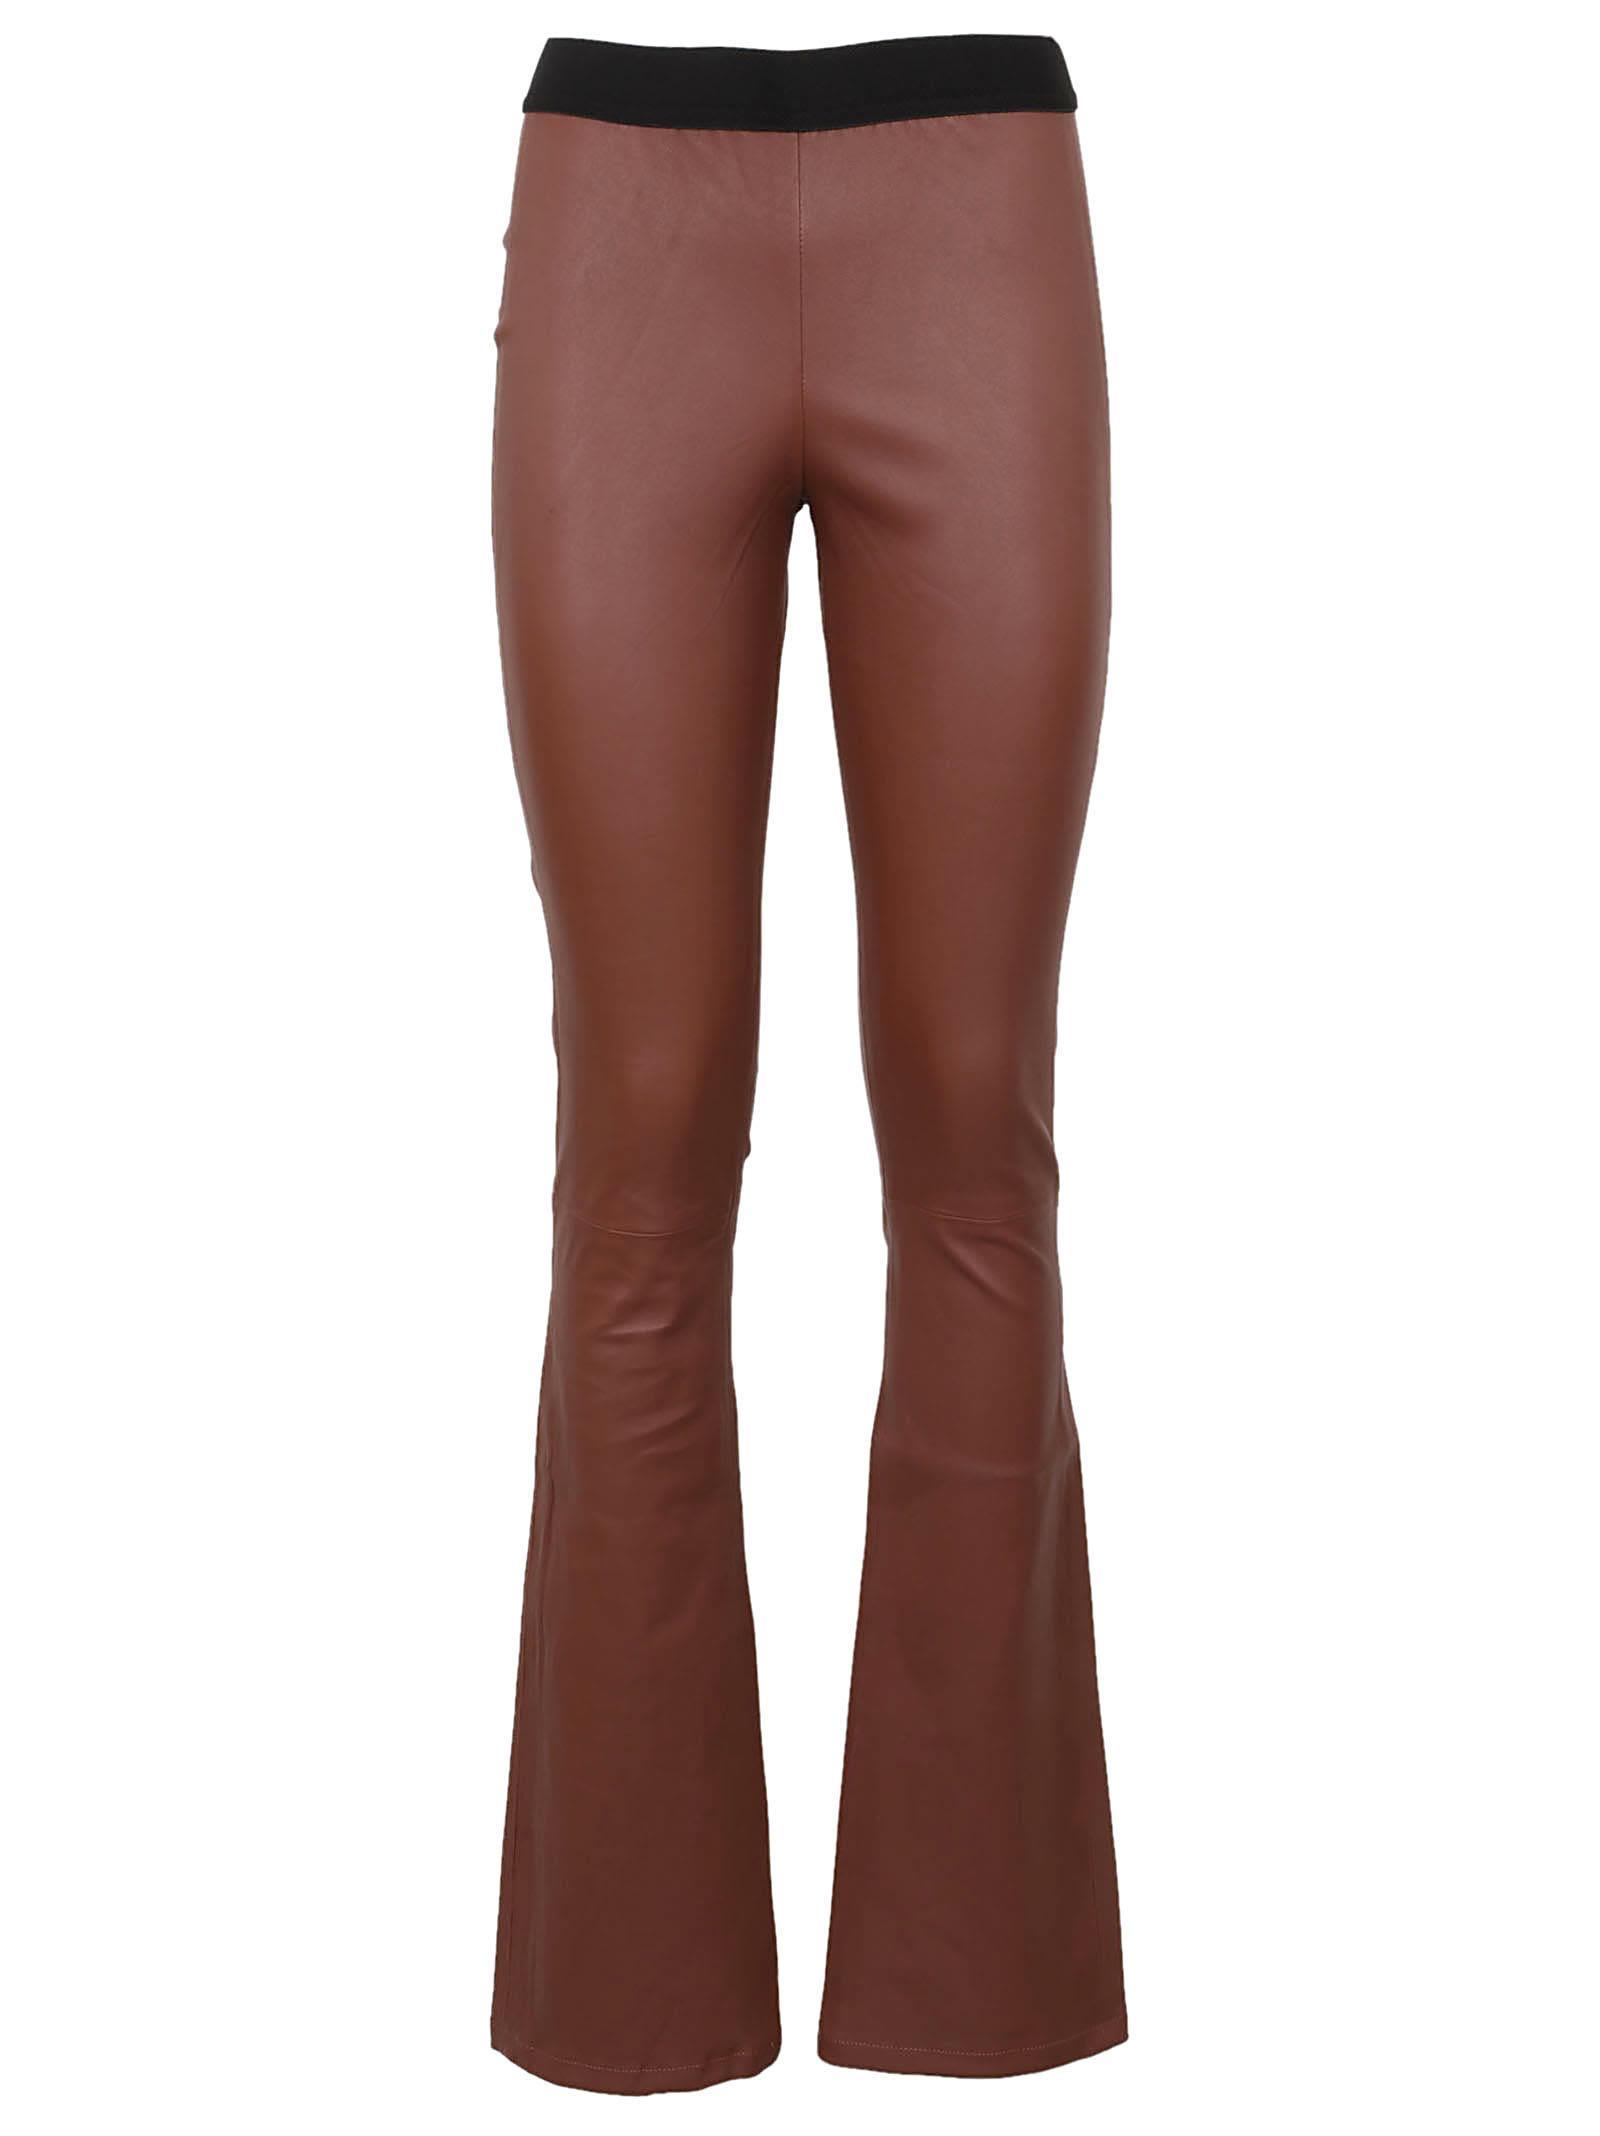 Zinga Leather Leggings